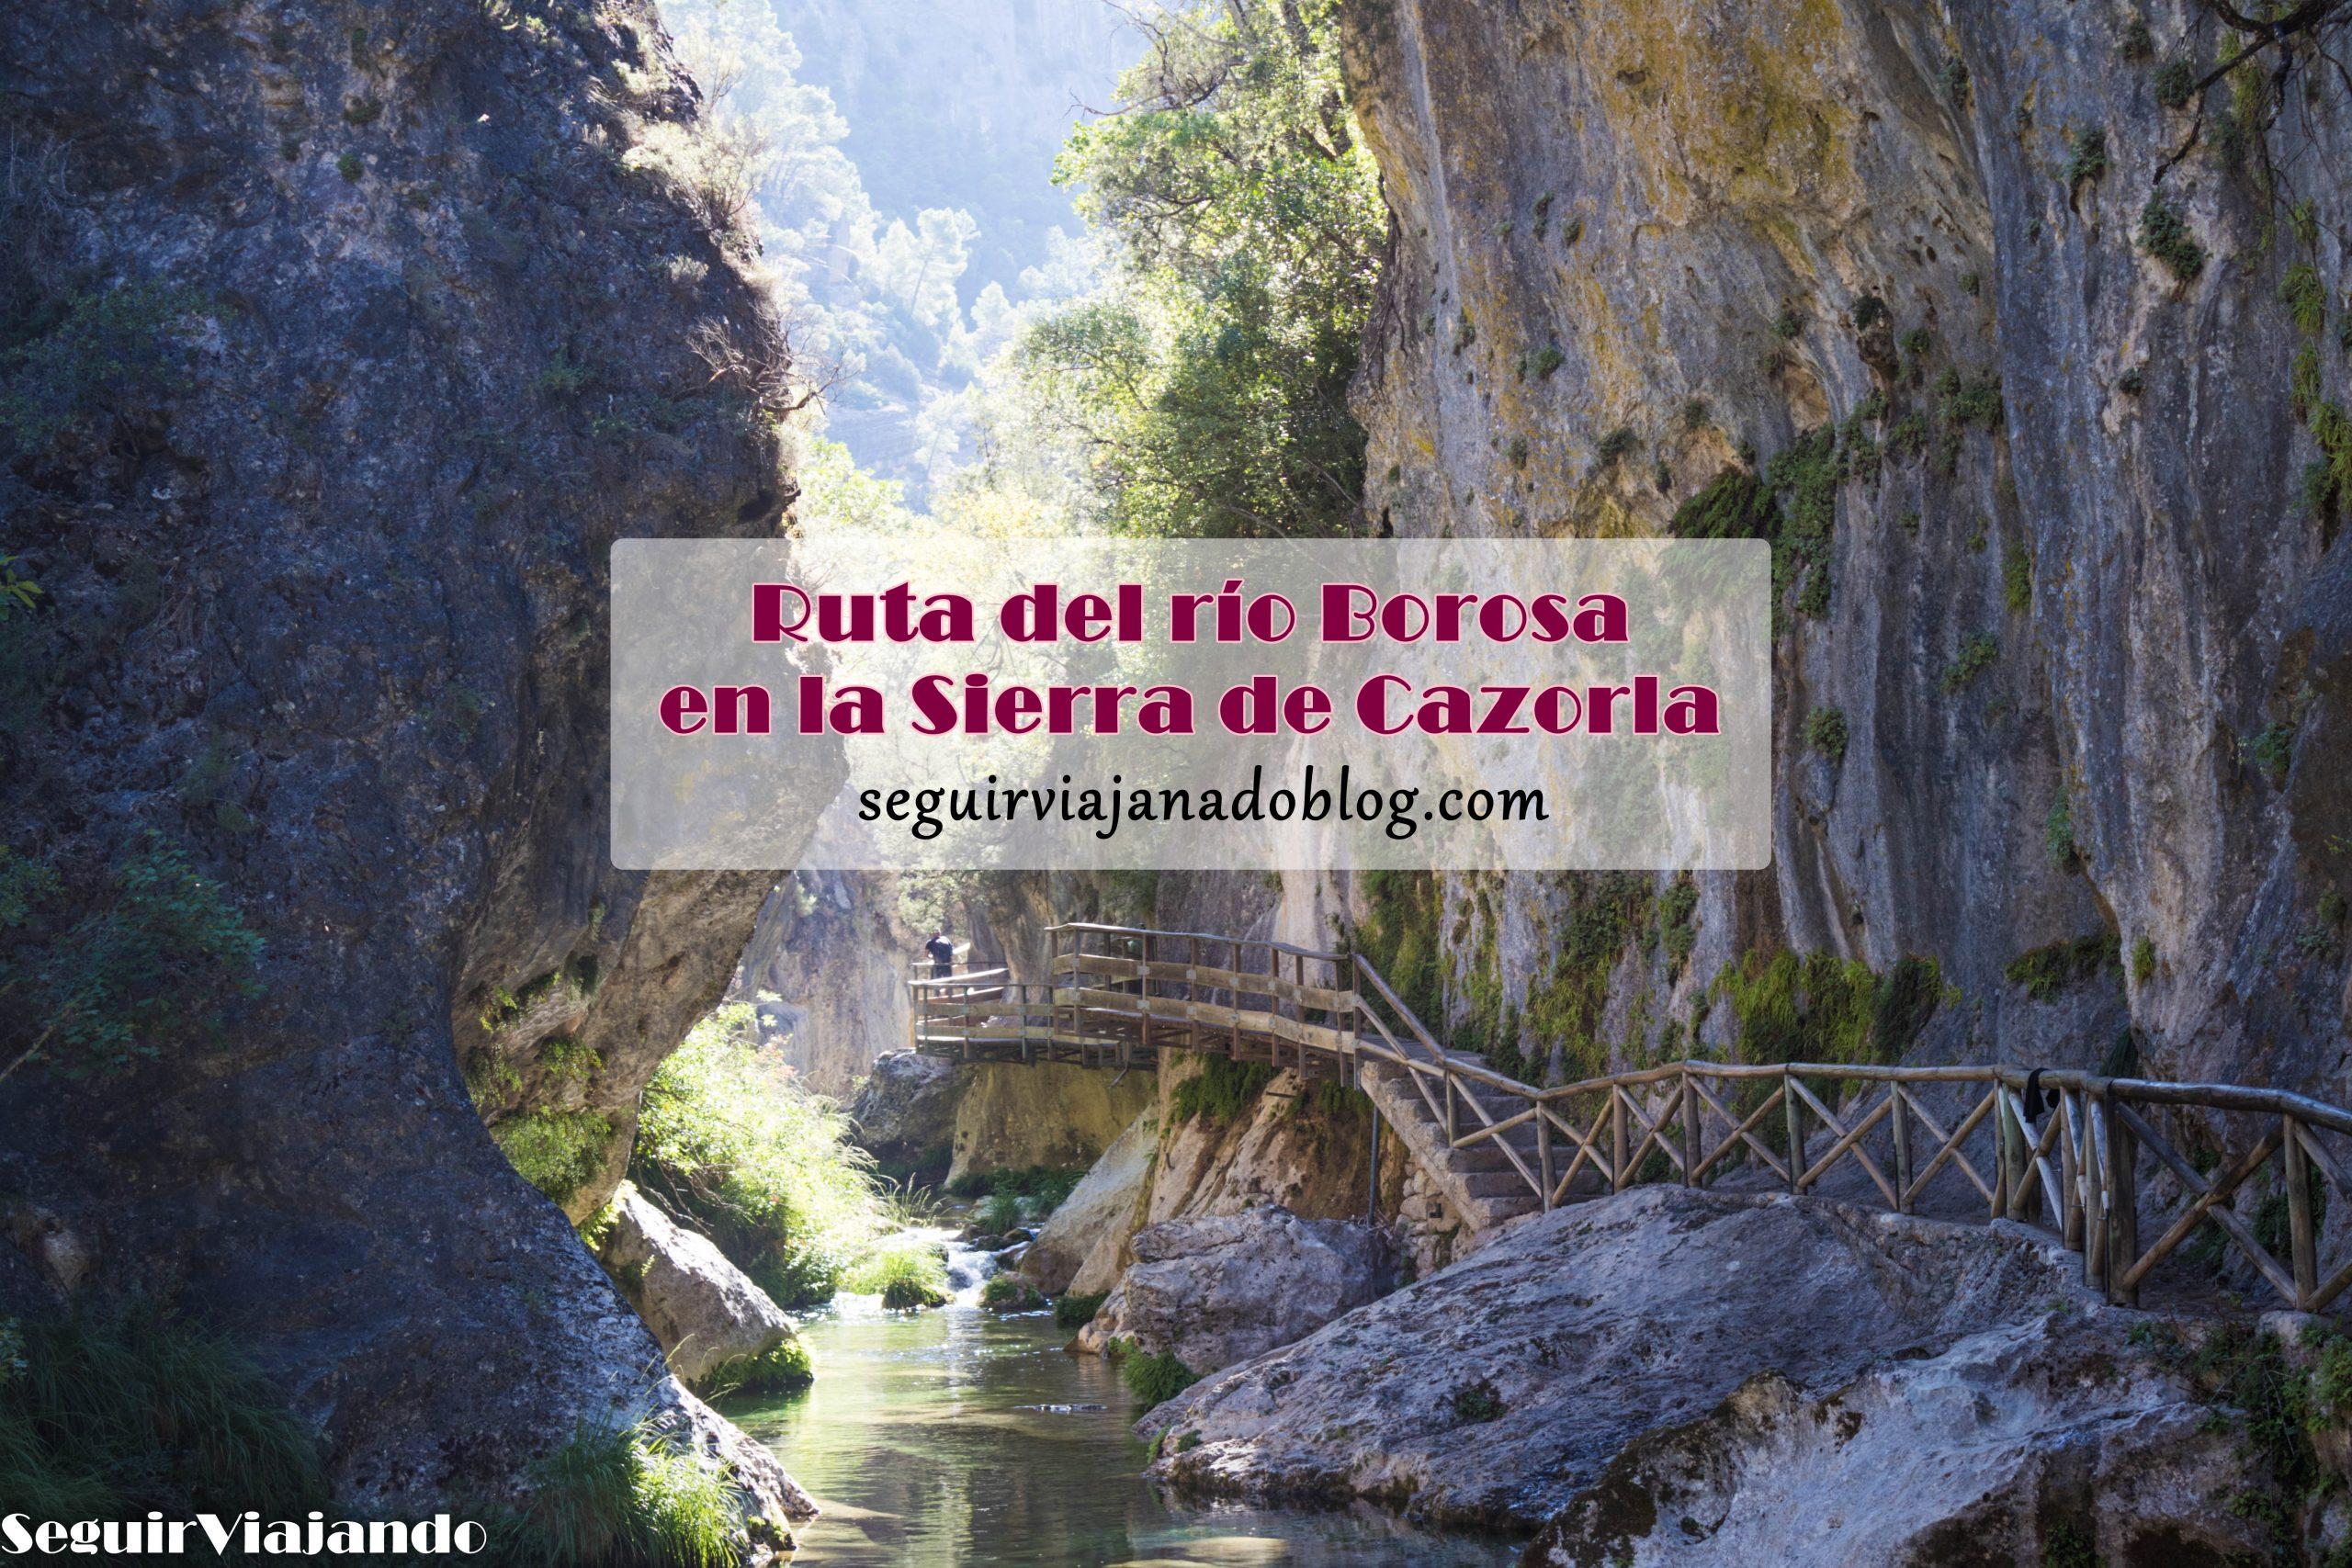 Ruta río Borosa Cazorla - Seguir Viajando